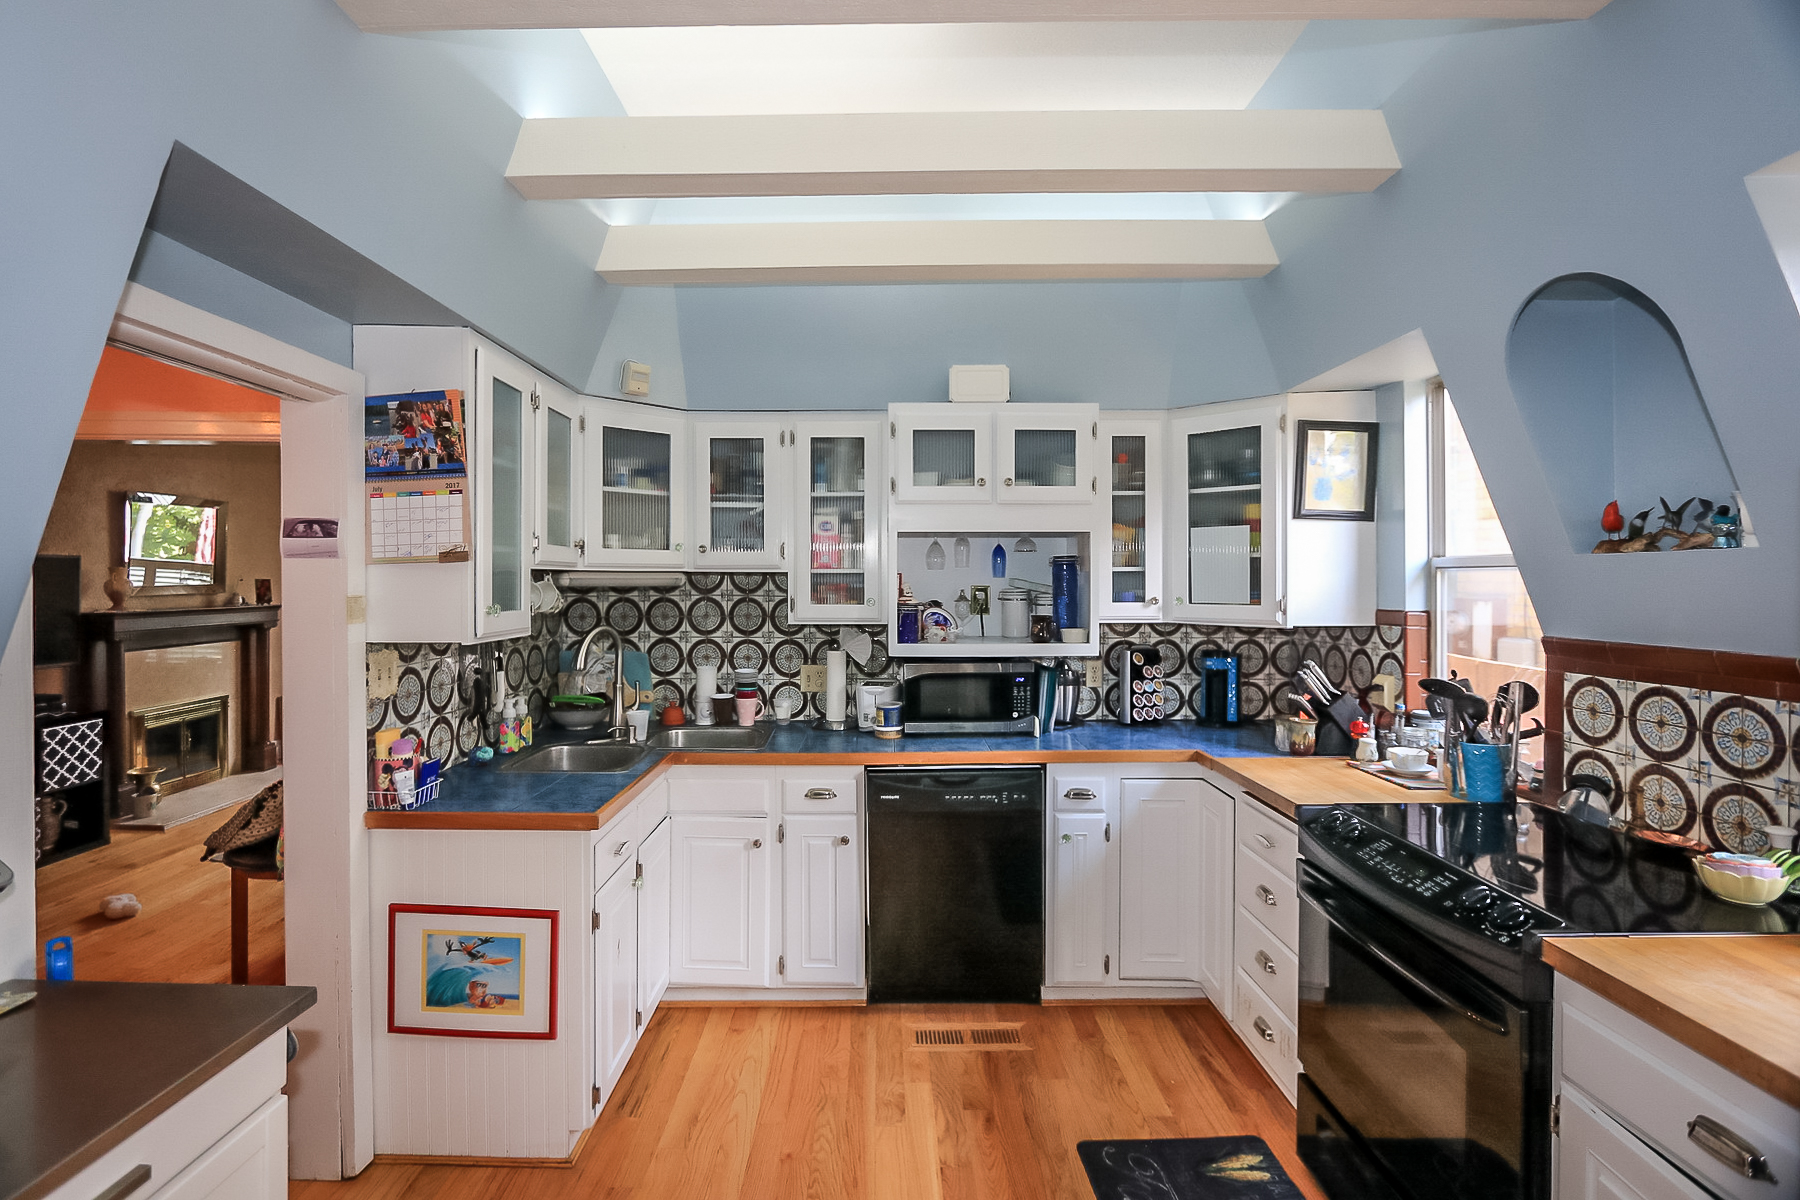 Kitchen of 363 Wall St, Salt Lake City, UT 84103